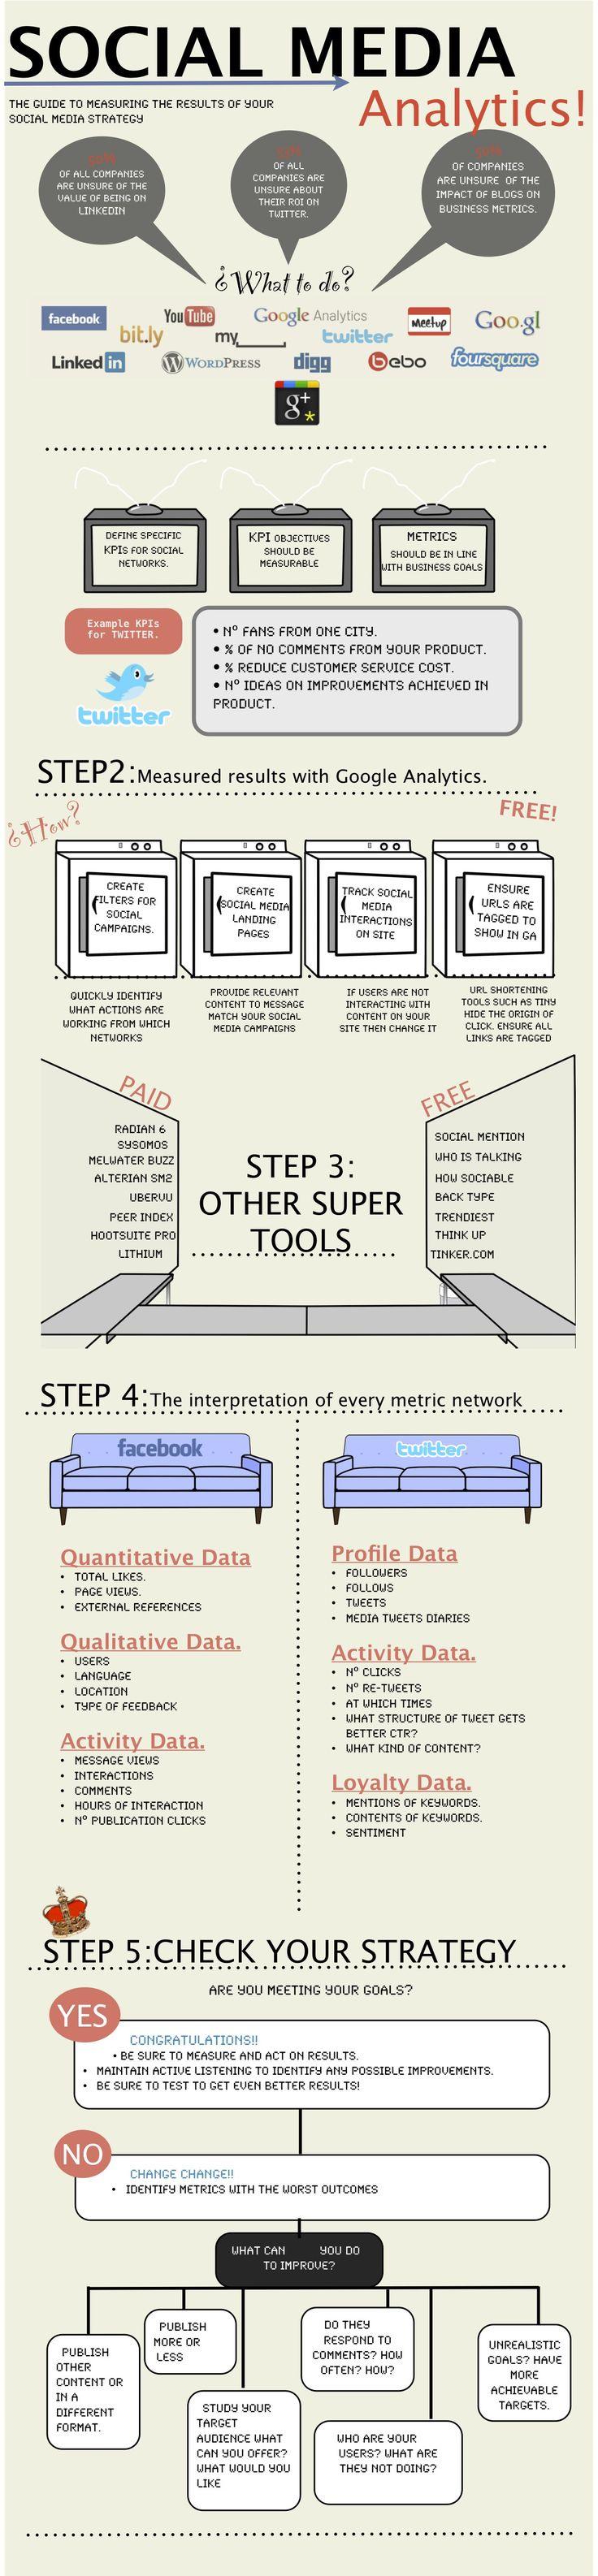 Social media analytics #SocialMedia #Analytics #Infographic